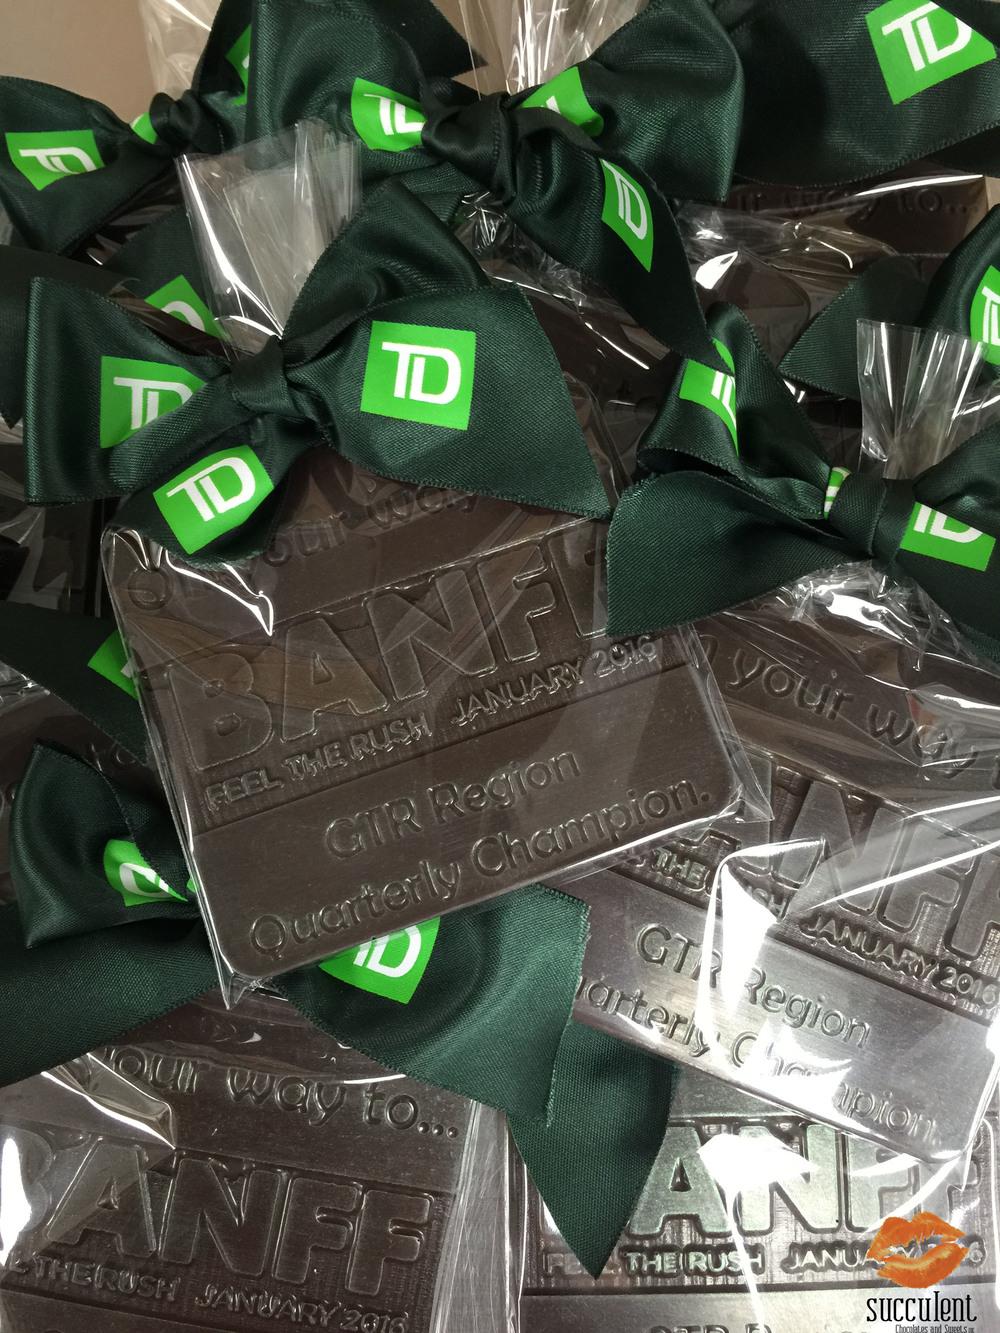 Copy of Succulent_Chocolates_Vaughan_Custom Bar_TD_Bank